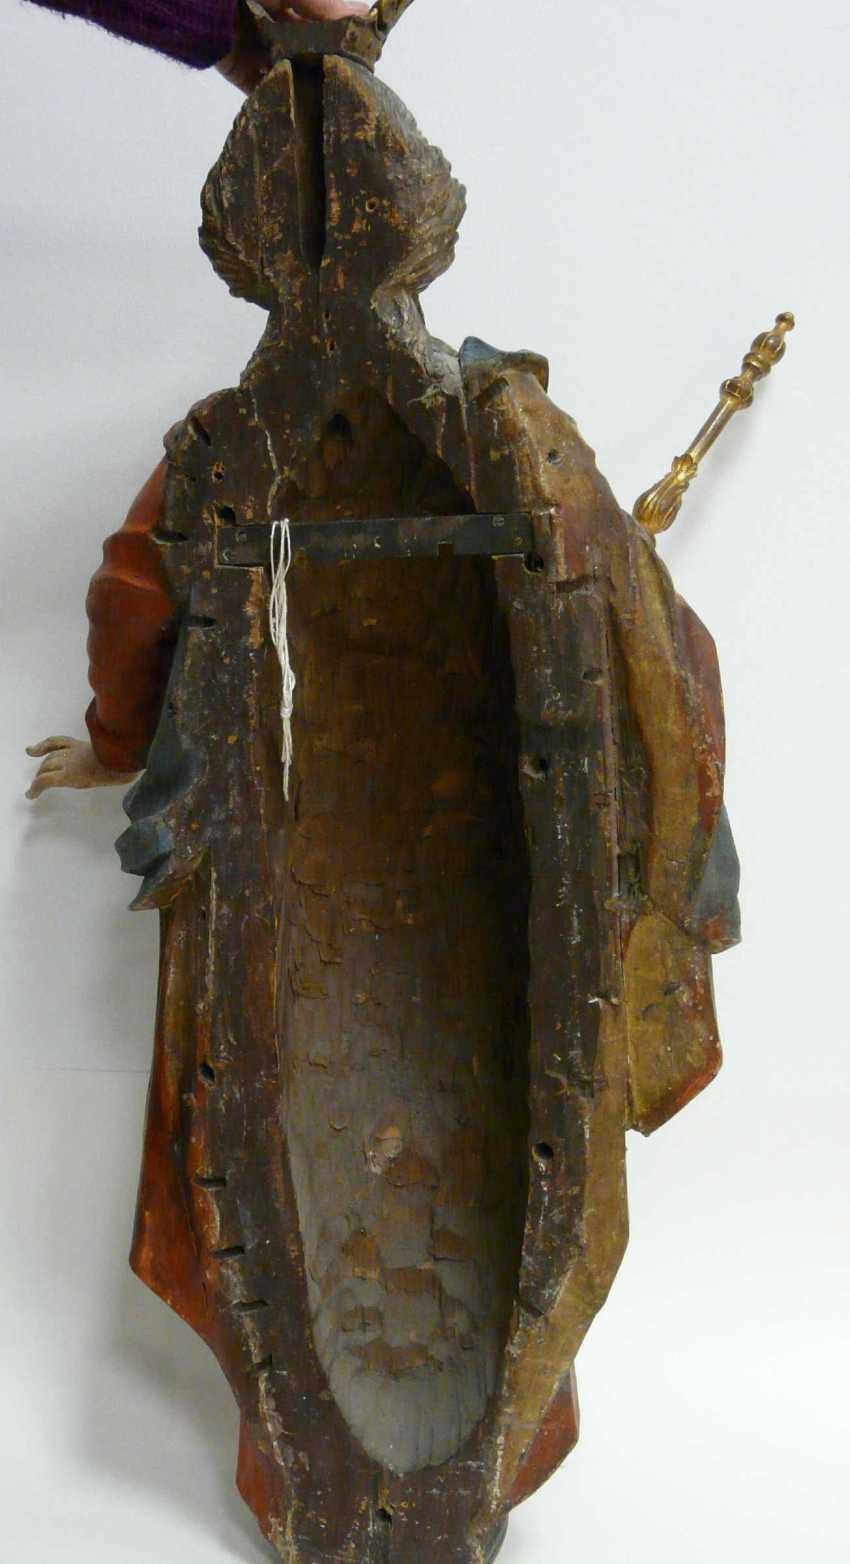 Maria Immaculata - photo 2